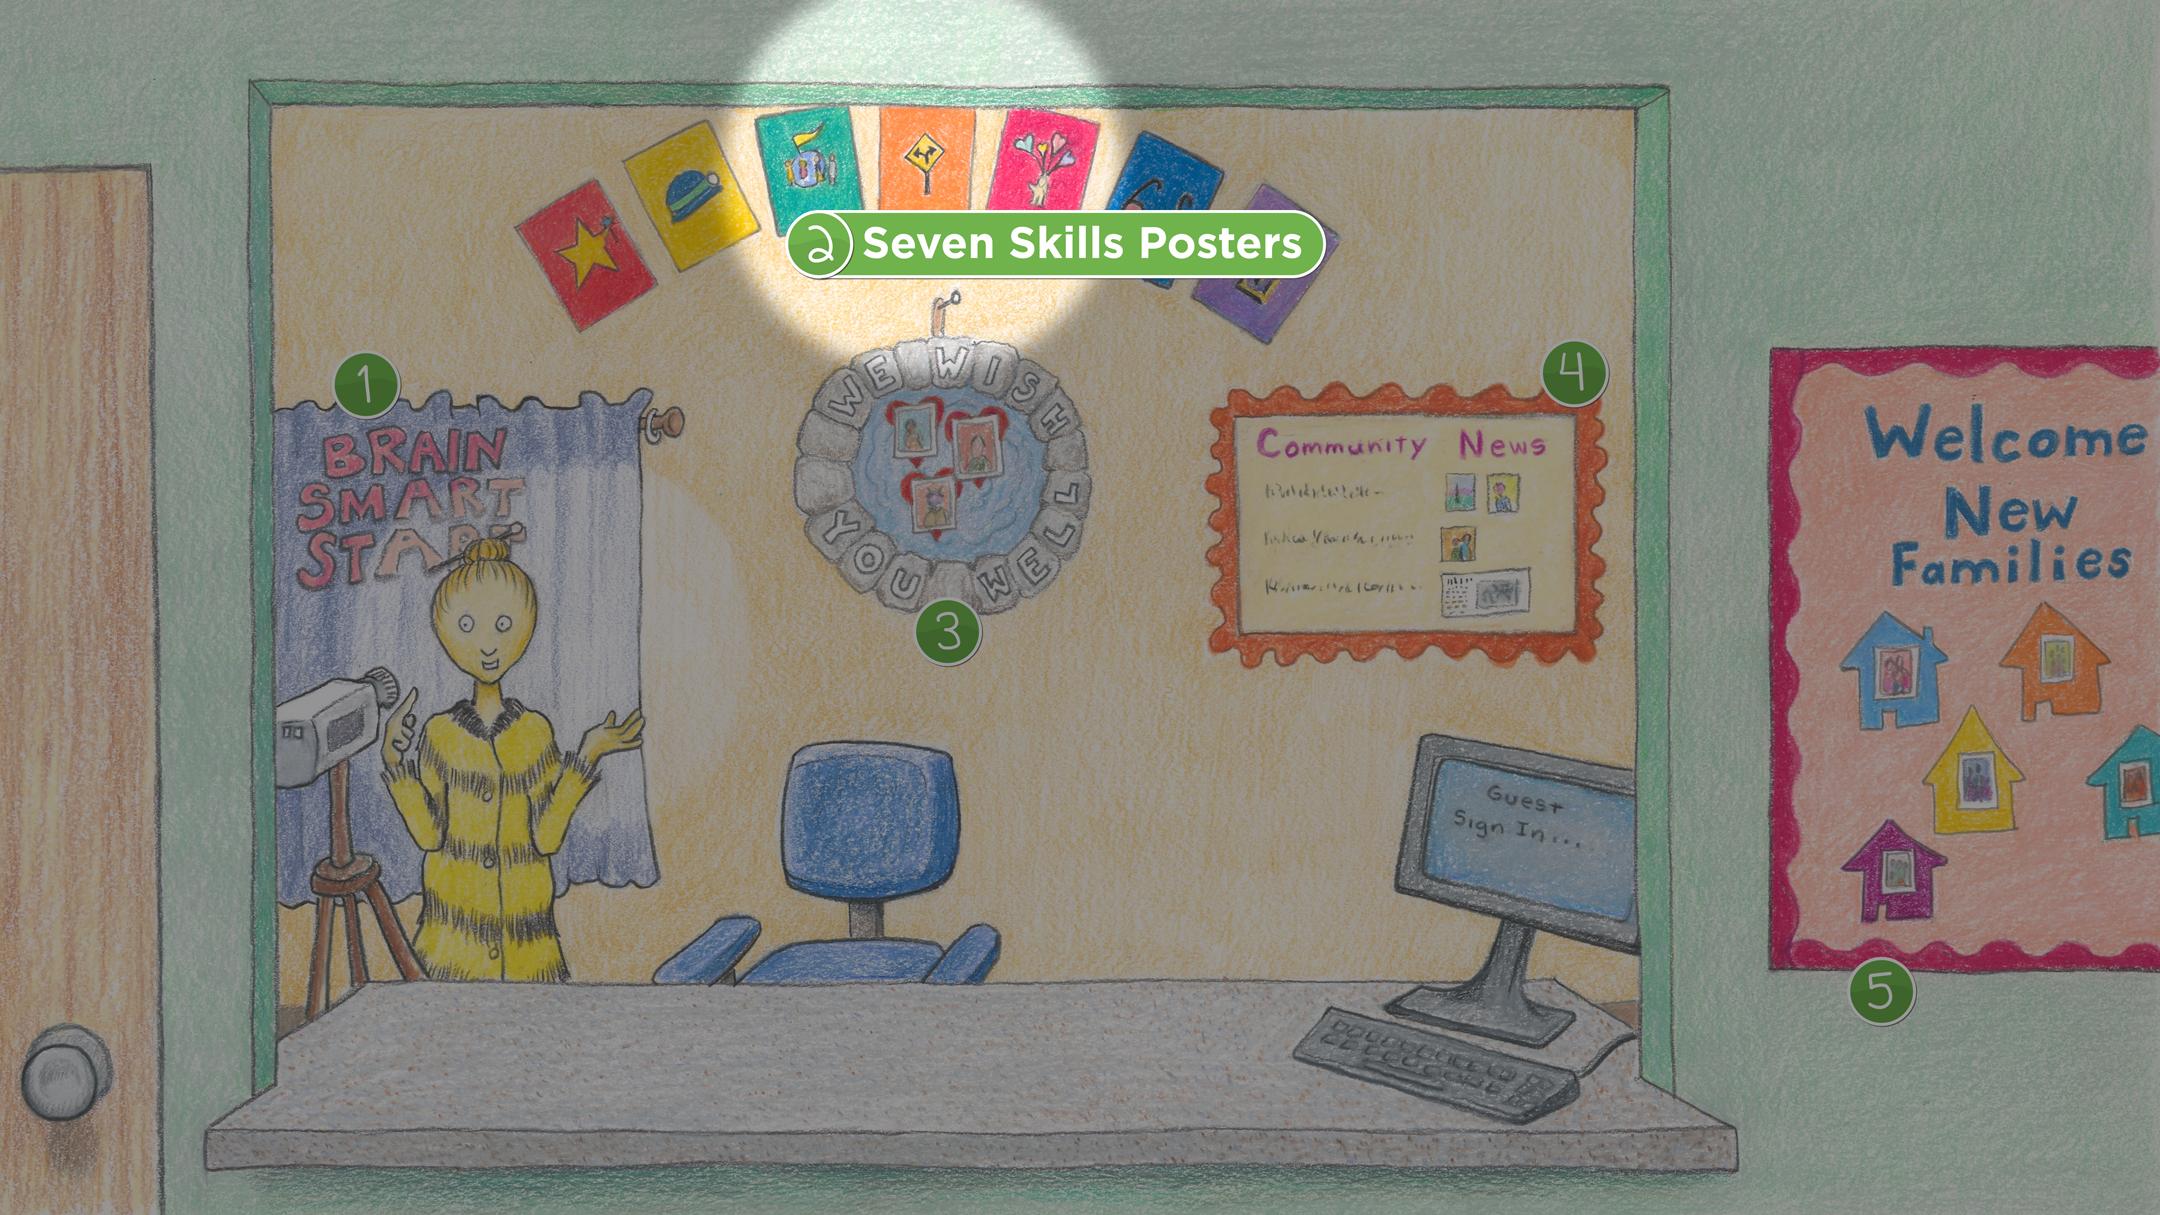 Reception: Seven Skills Posters